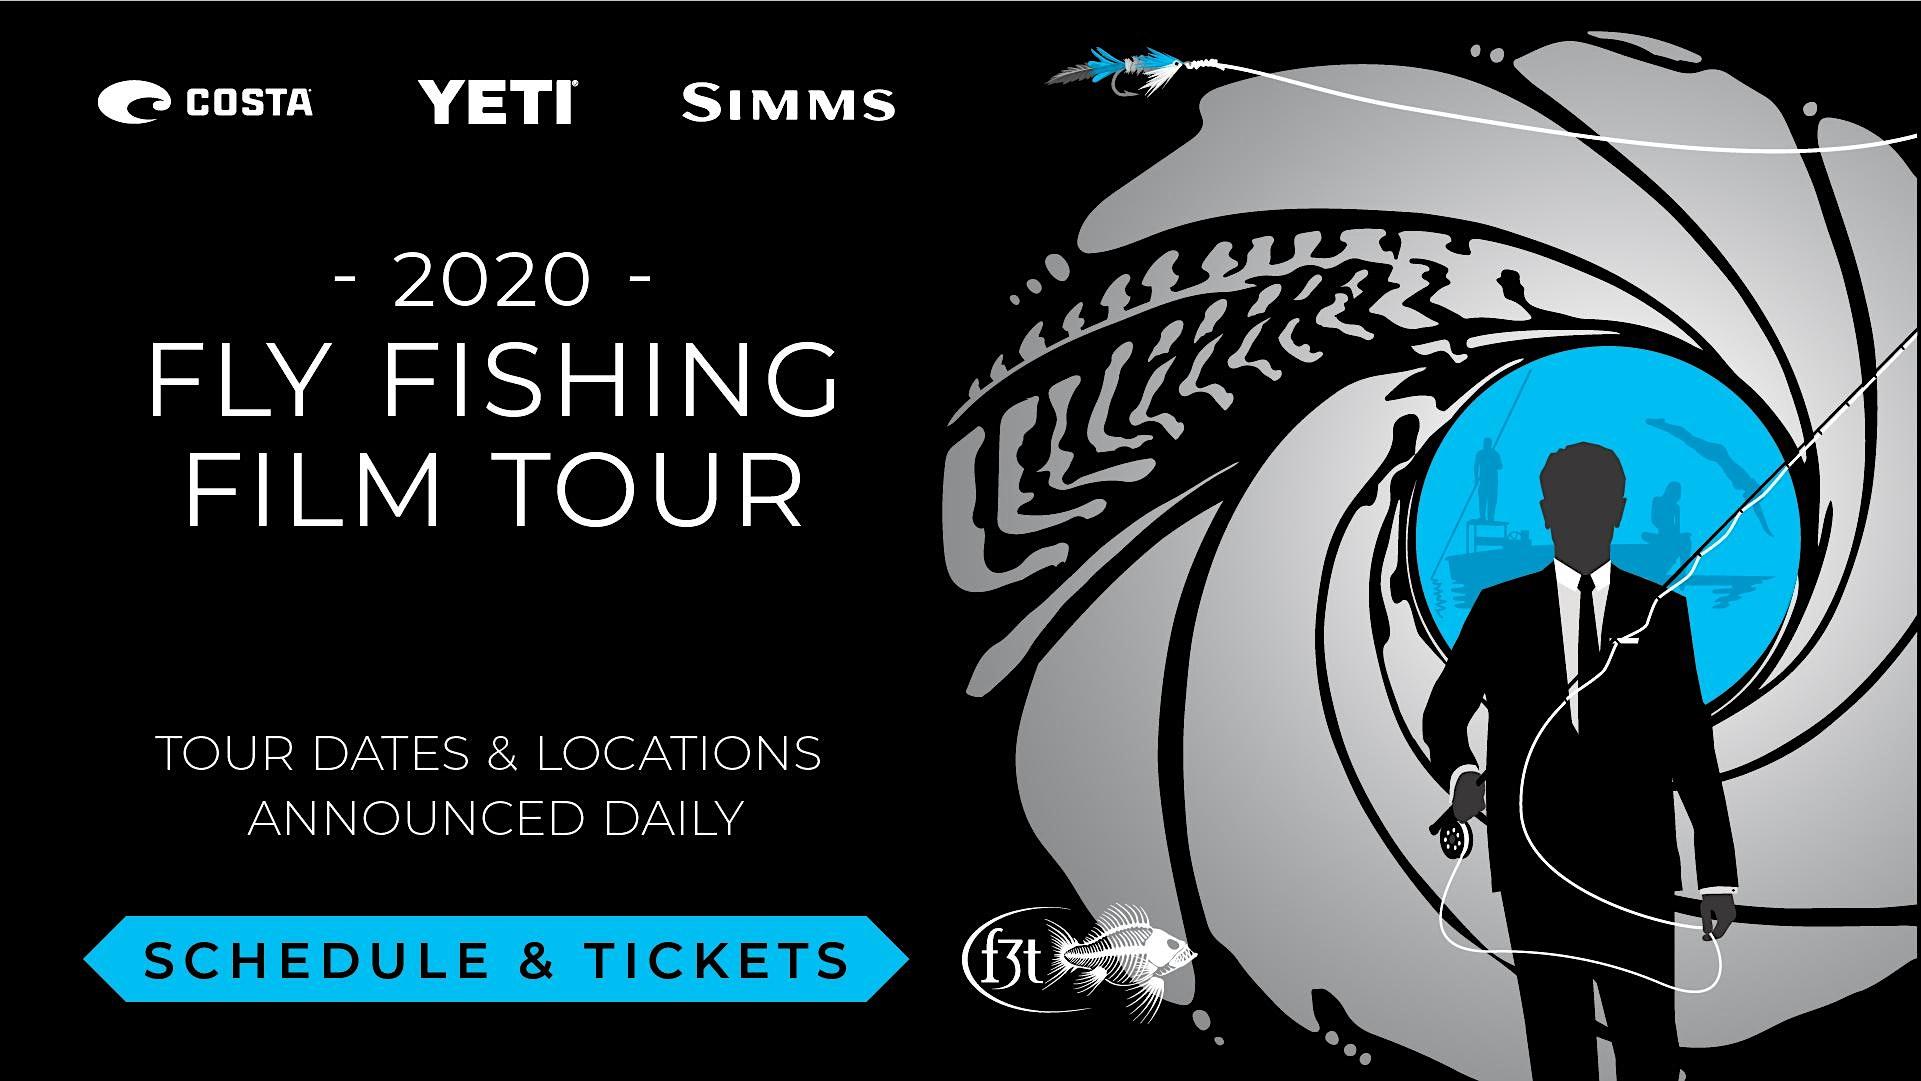 Fly Fishing Film Tour 2020